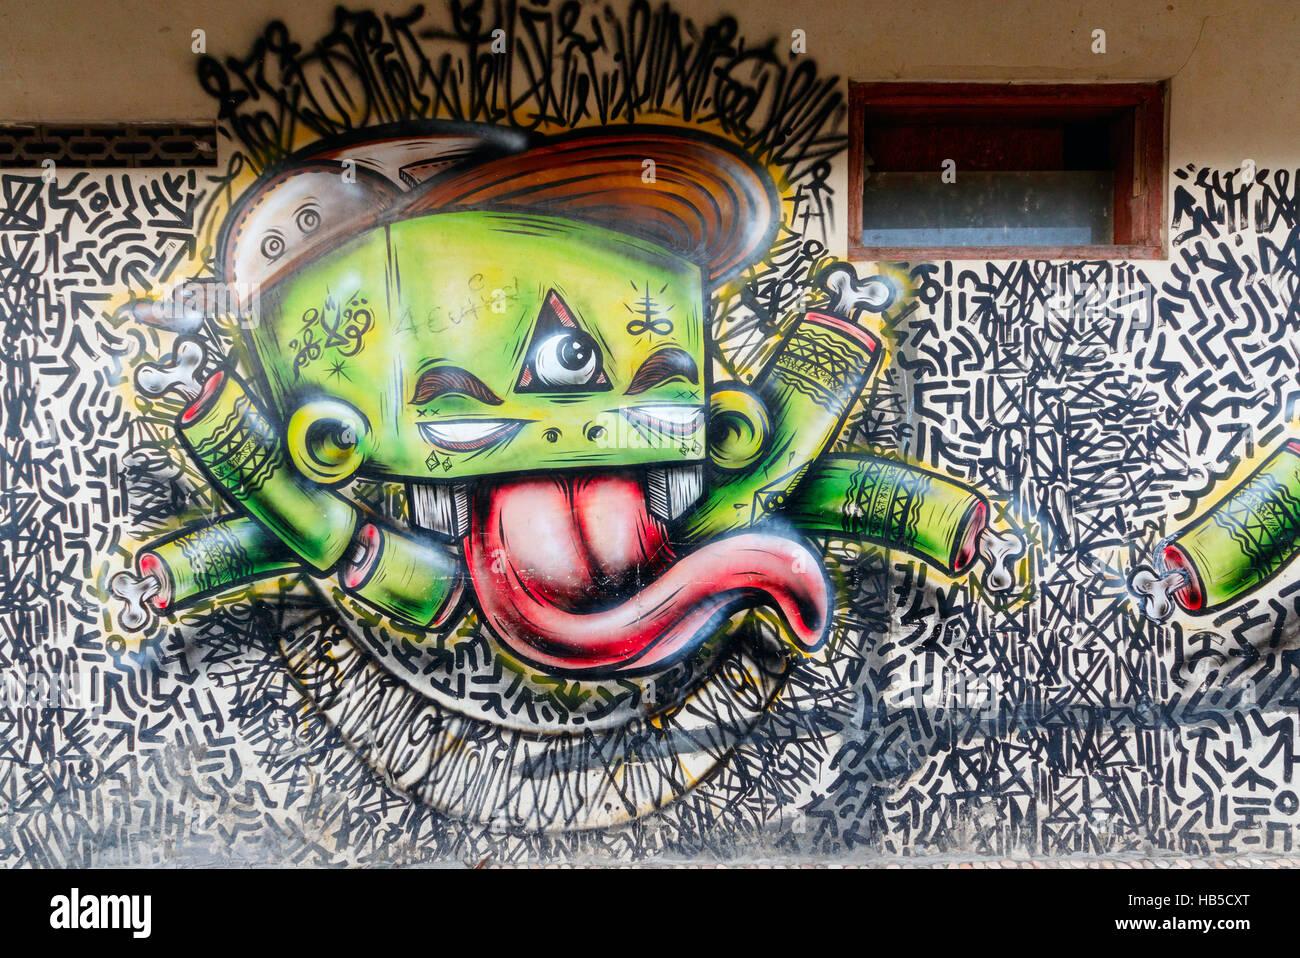 Graffiti in a poor neighbourhood in yogyakarta graffiti in yogyakarta often has a political message java indonesia